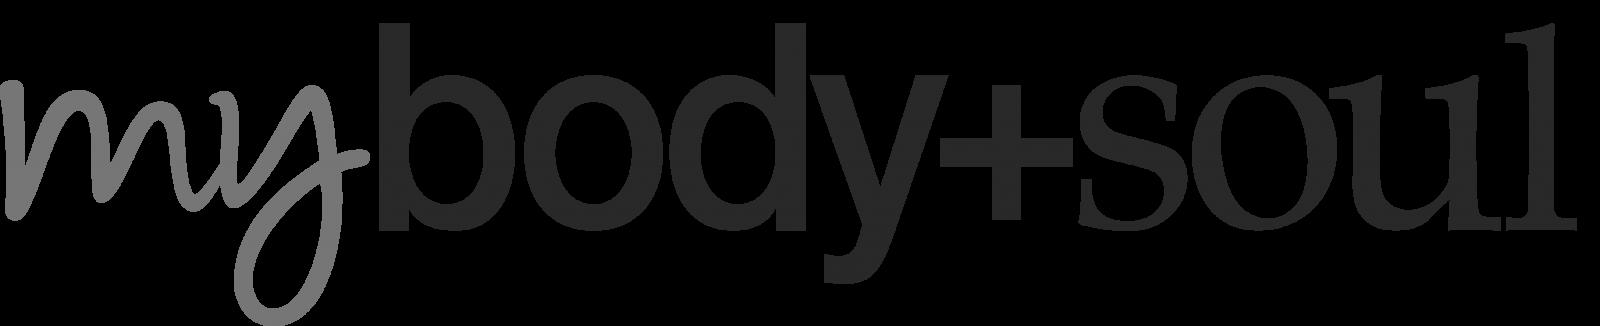 Mybody And Soul